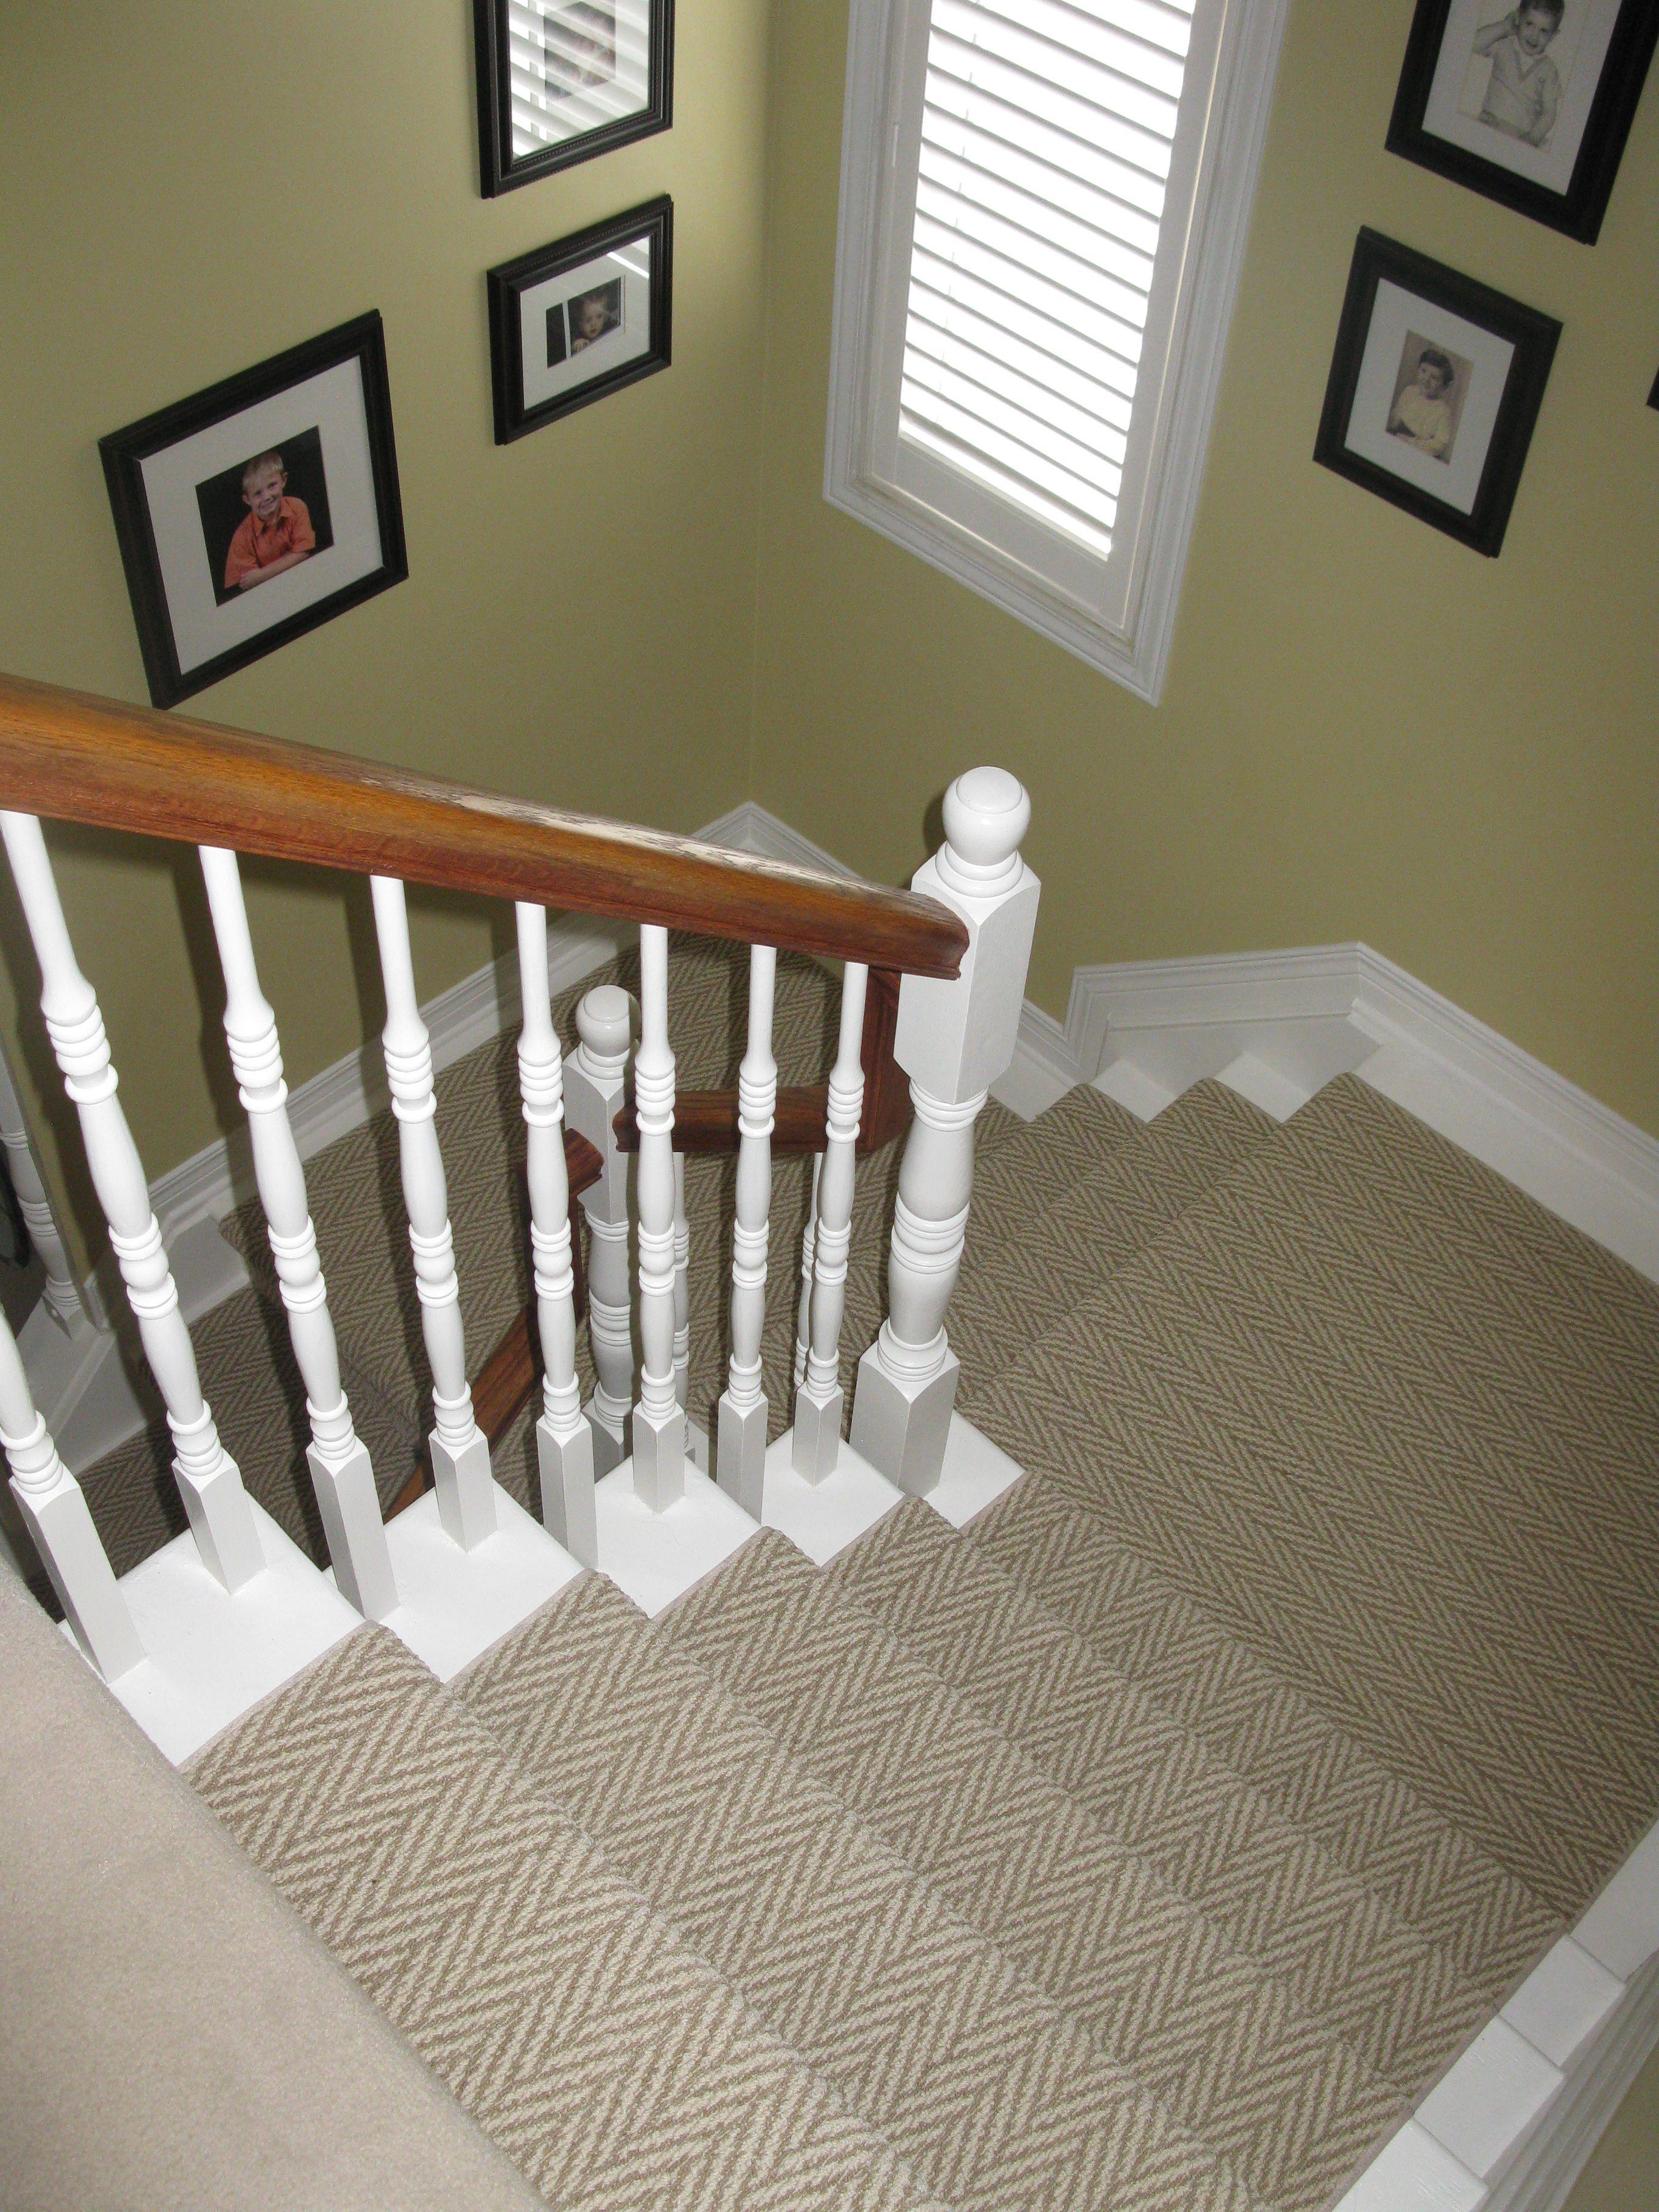 Best Tuftex Only Natural In Fine Grain Stair Runner Hall Decor 640 x 480